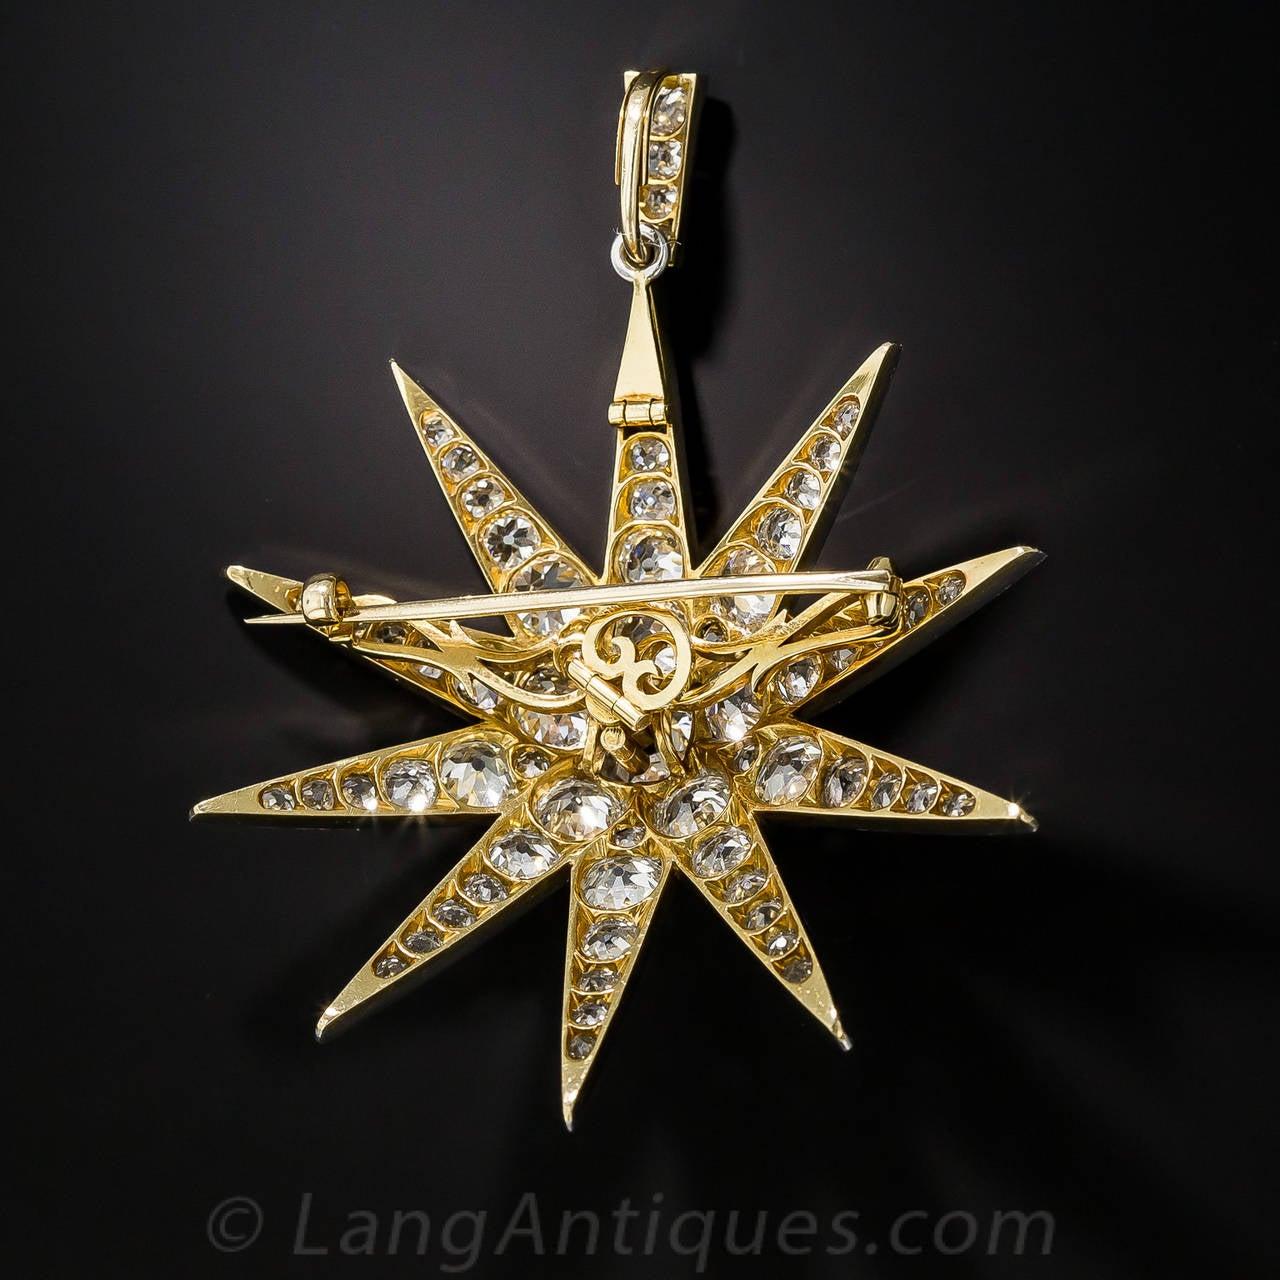 Victorian 2.13 Carat Cushion Cut Diamond Platinum Star Brooch Pendant - GIA Cert 3